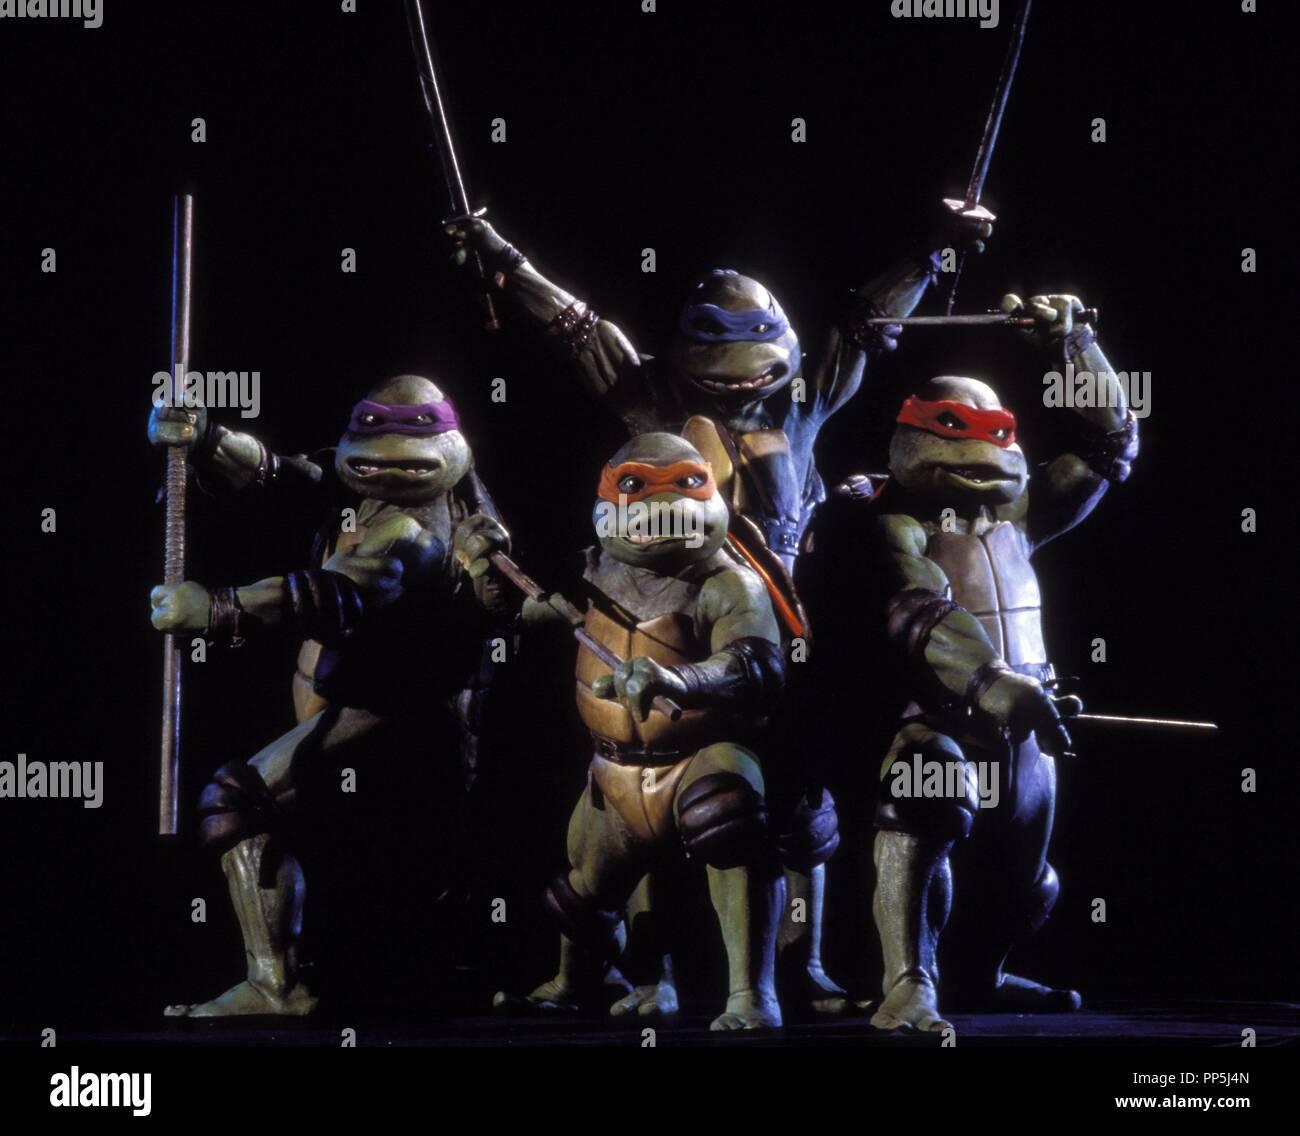 Original film title: TEENAGE MUTANT NINJA TURTLES. English title: TEENAGE MUTANT NINJA TURTLES. Year: 1990. Director: STEVE BARRON. Credit: NEW LINE CINEMA / Album - Stock Image